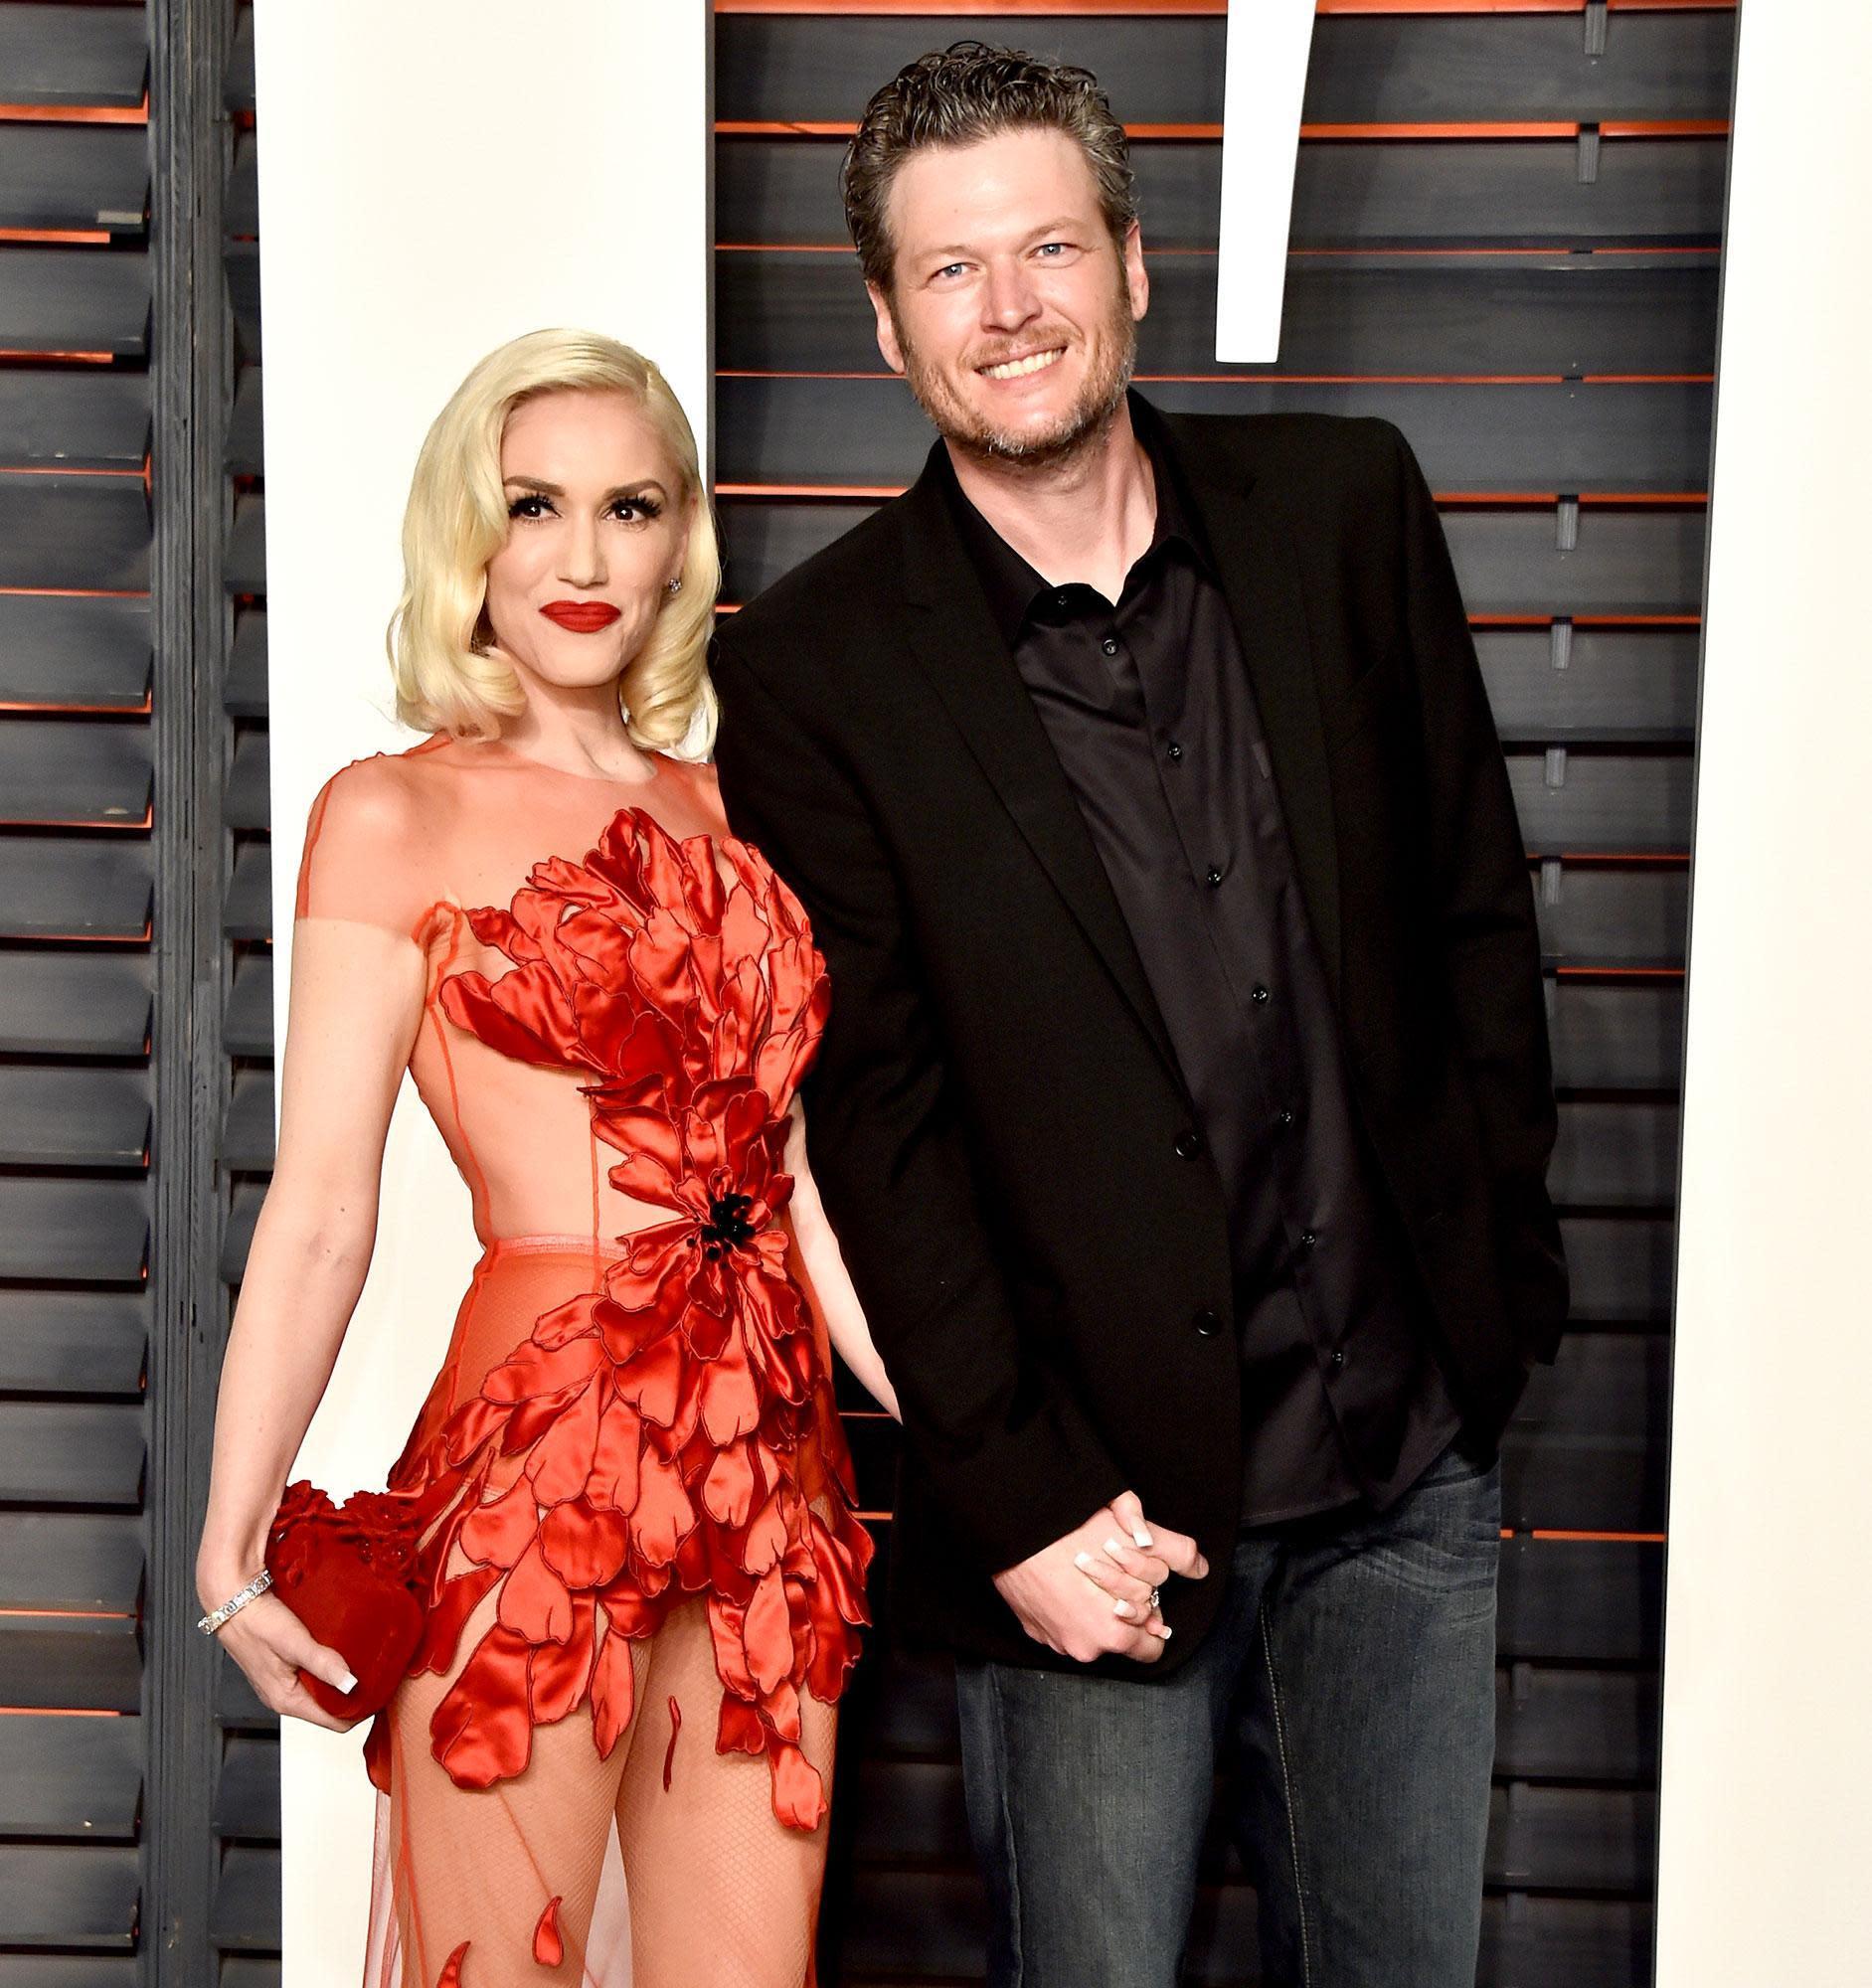 Blake Shelton Calls Gwen Stefani Hot On The Voice -8396